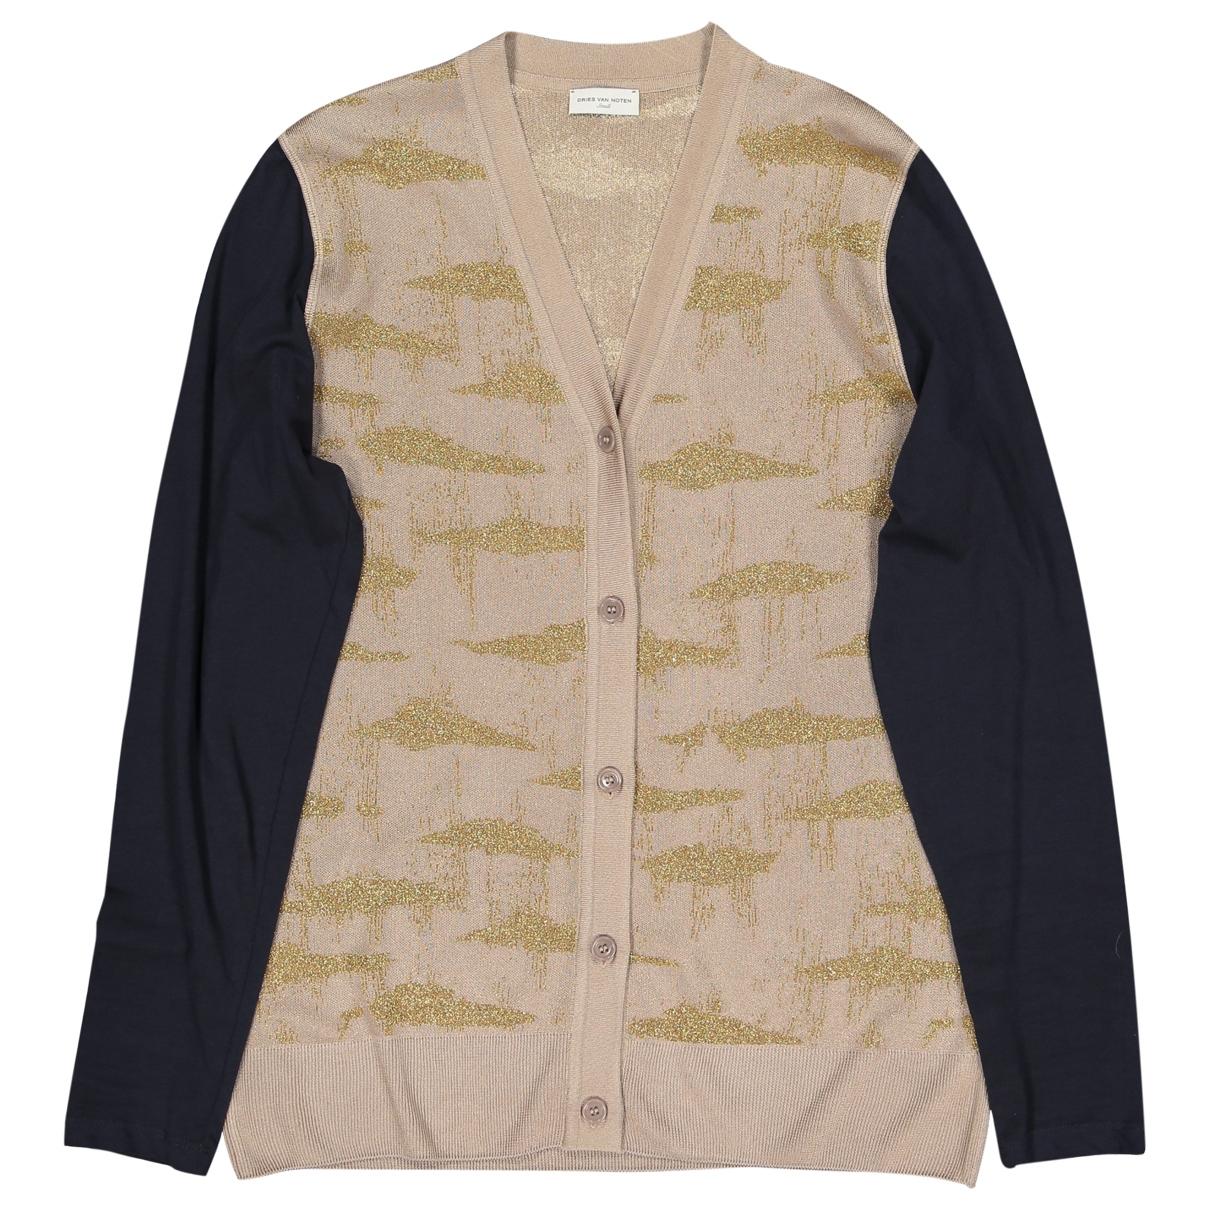 Dries Van Noten - Pull   pour femme en coton - beige